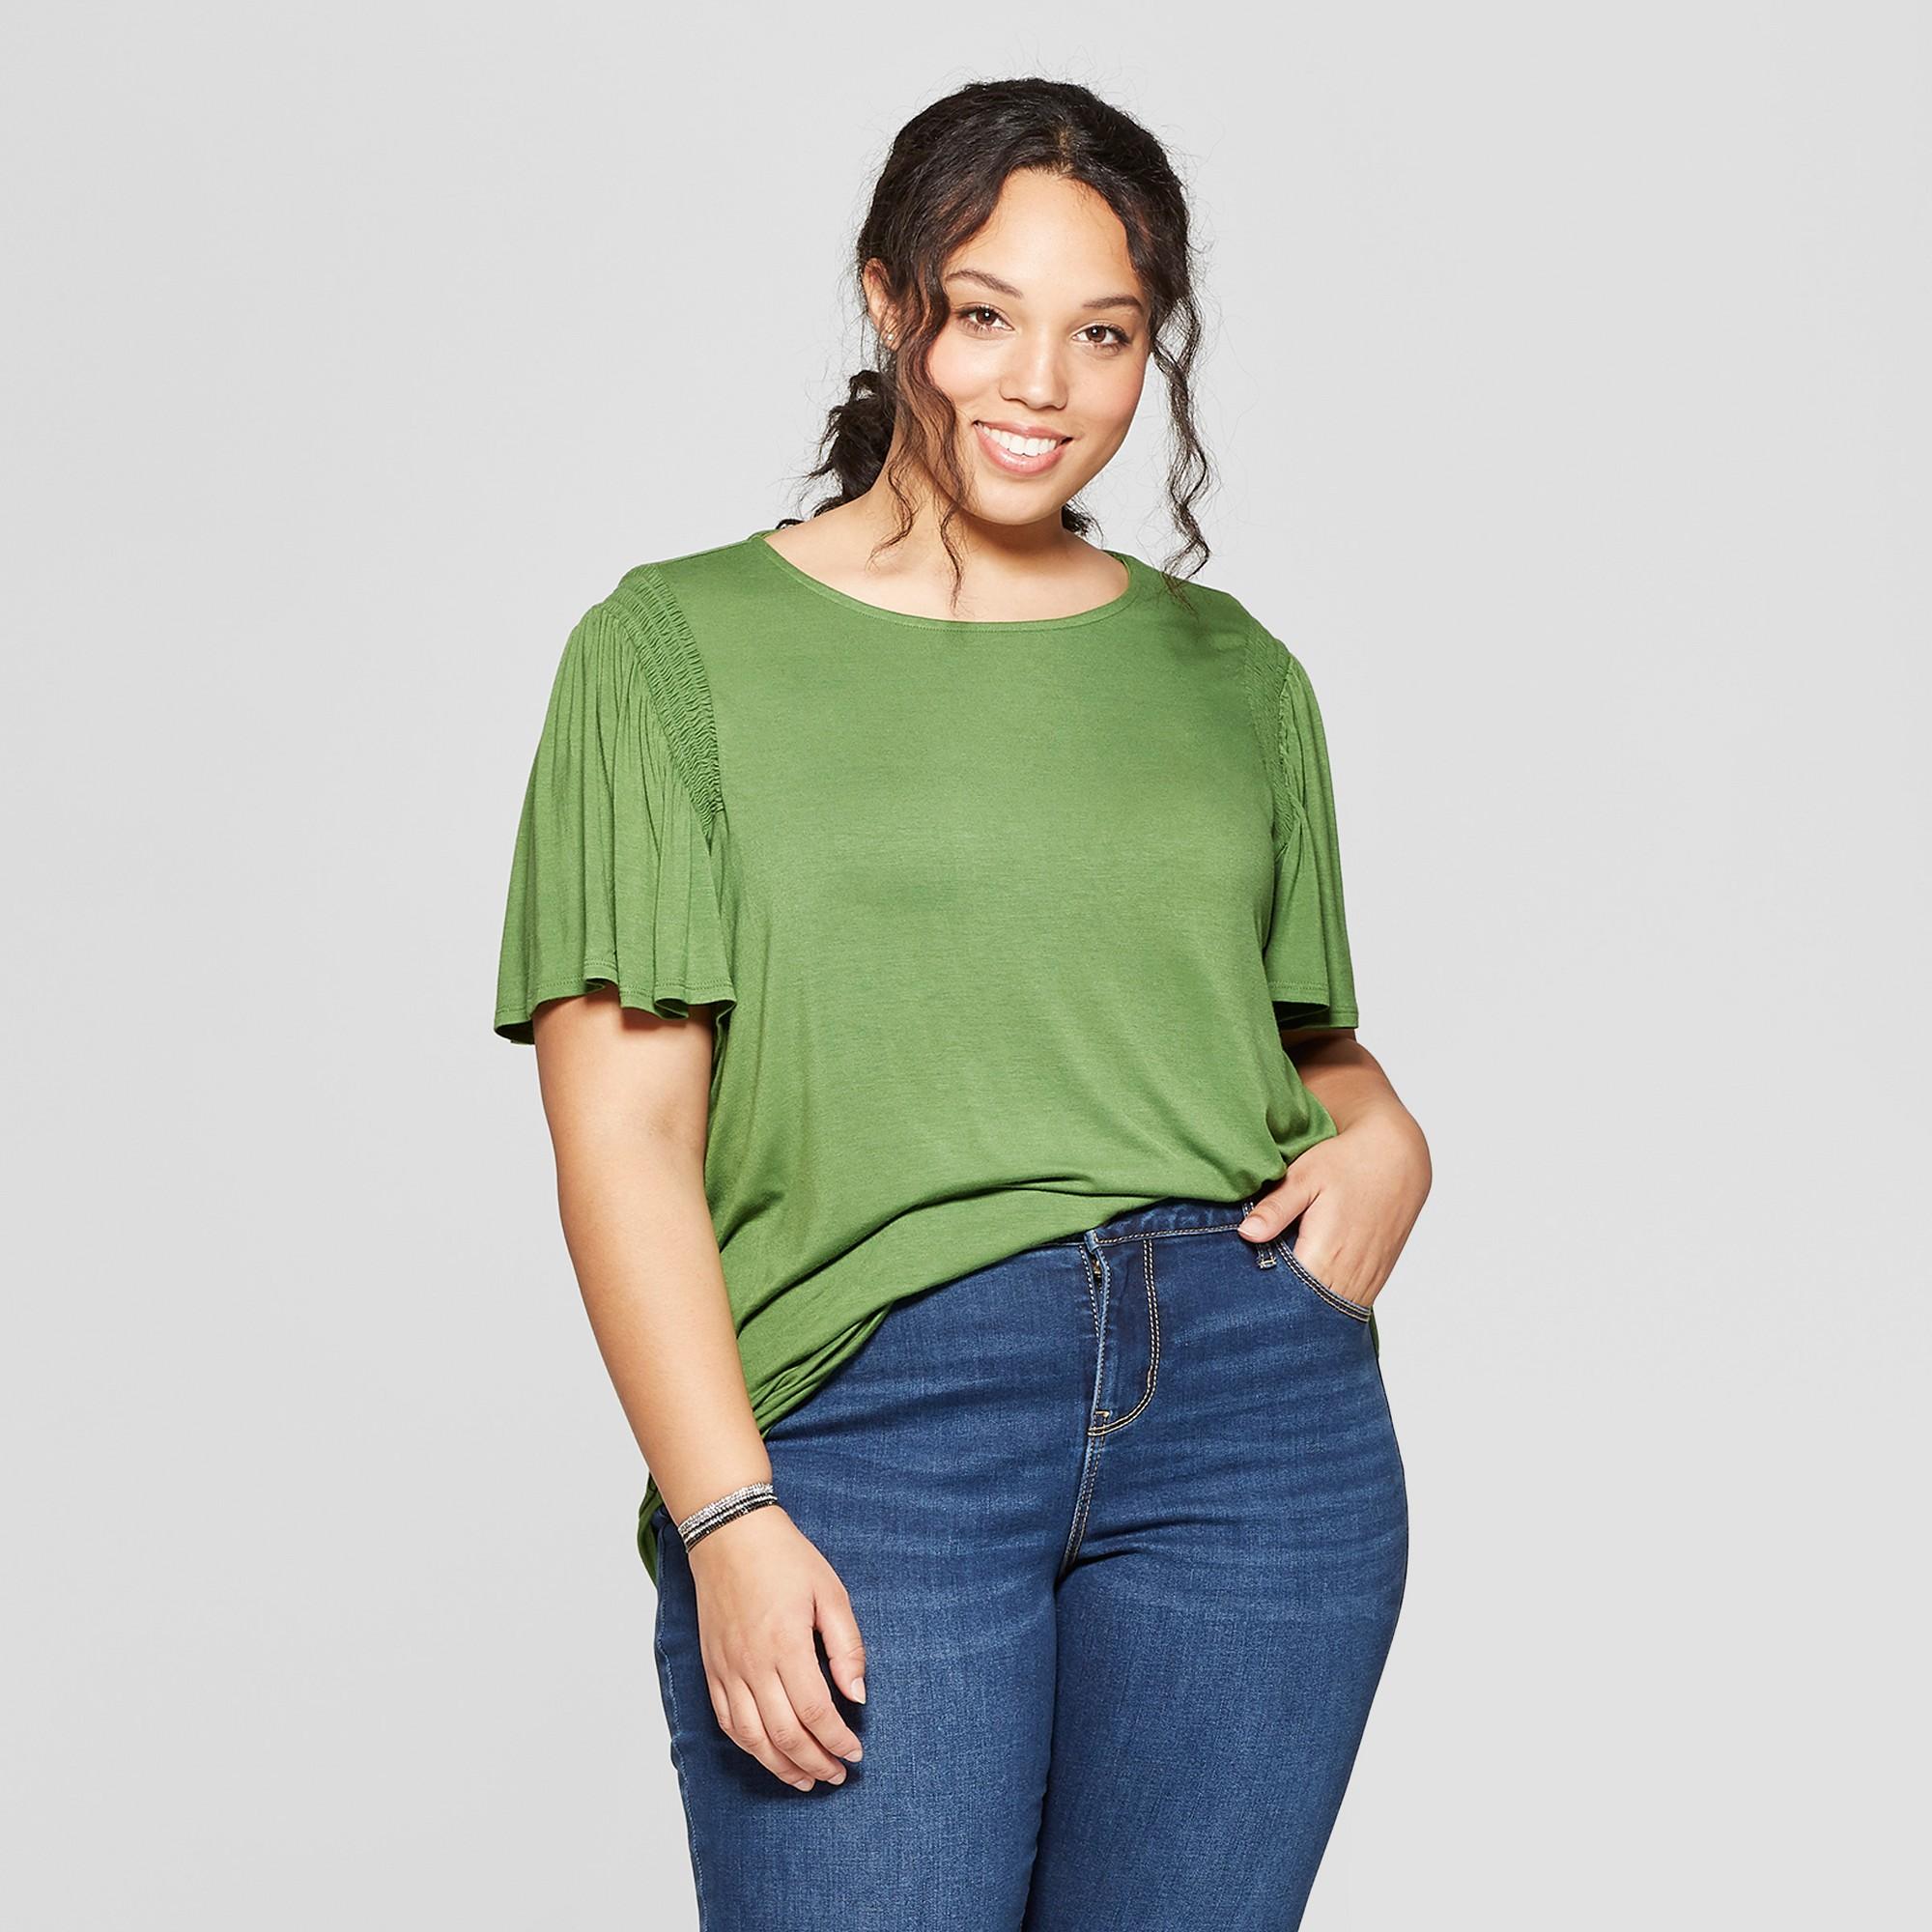 Women's Plus Size Short Sleeve Crew Neck Smocked Detail Knit T-Shirt - Ava & Viv Green 2X